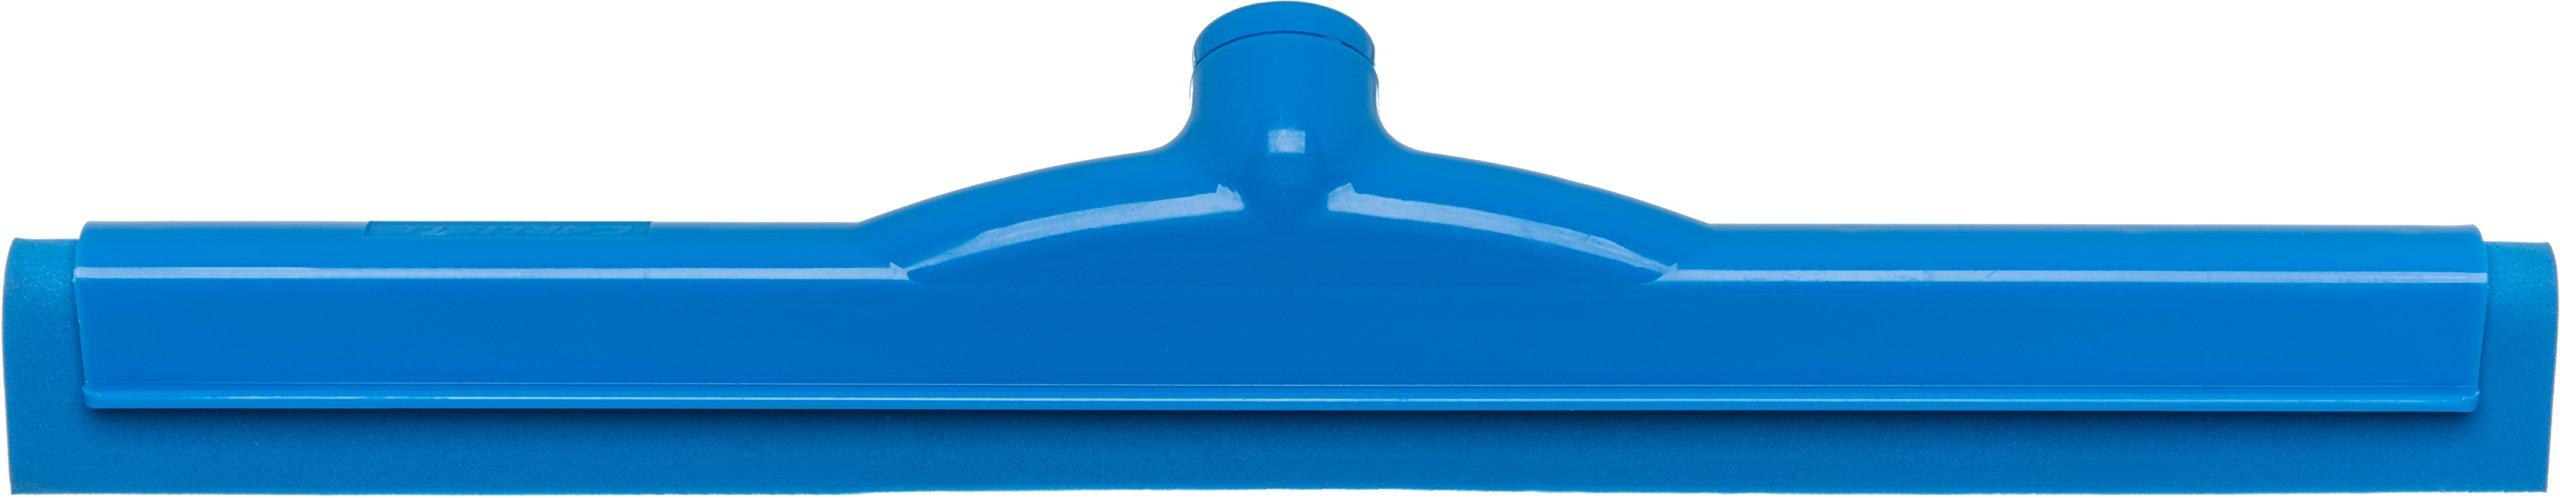 Carlisle 4156714 Spectrum Plastic Double Foam Rubber Hygienic Floor Squeegee, 18'' Width, Blue (Case of 6) by Carlisle (Image #2)